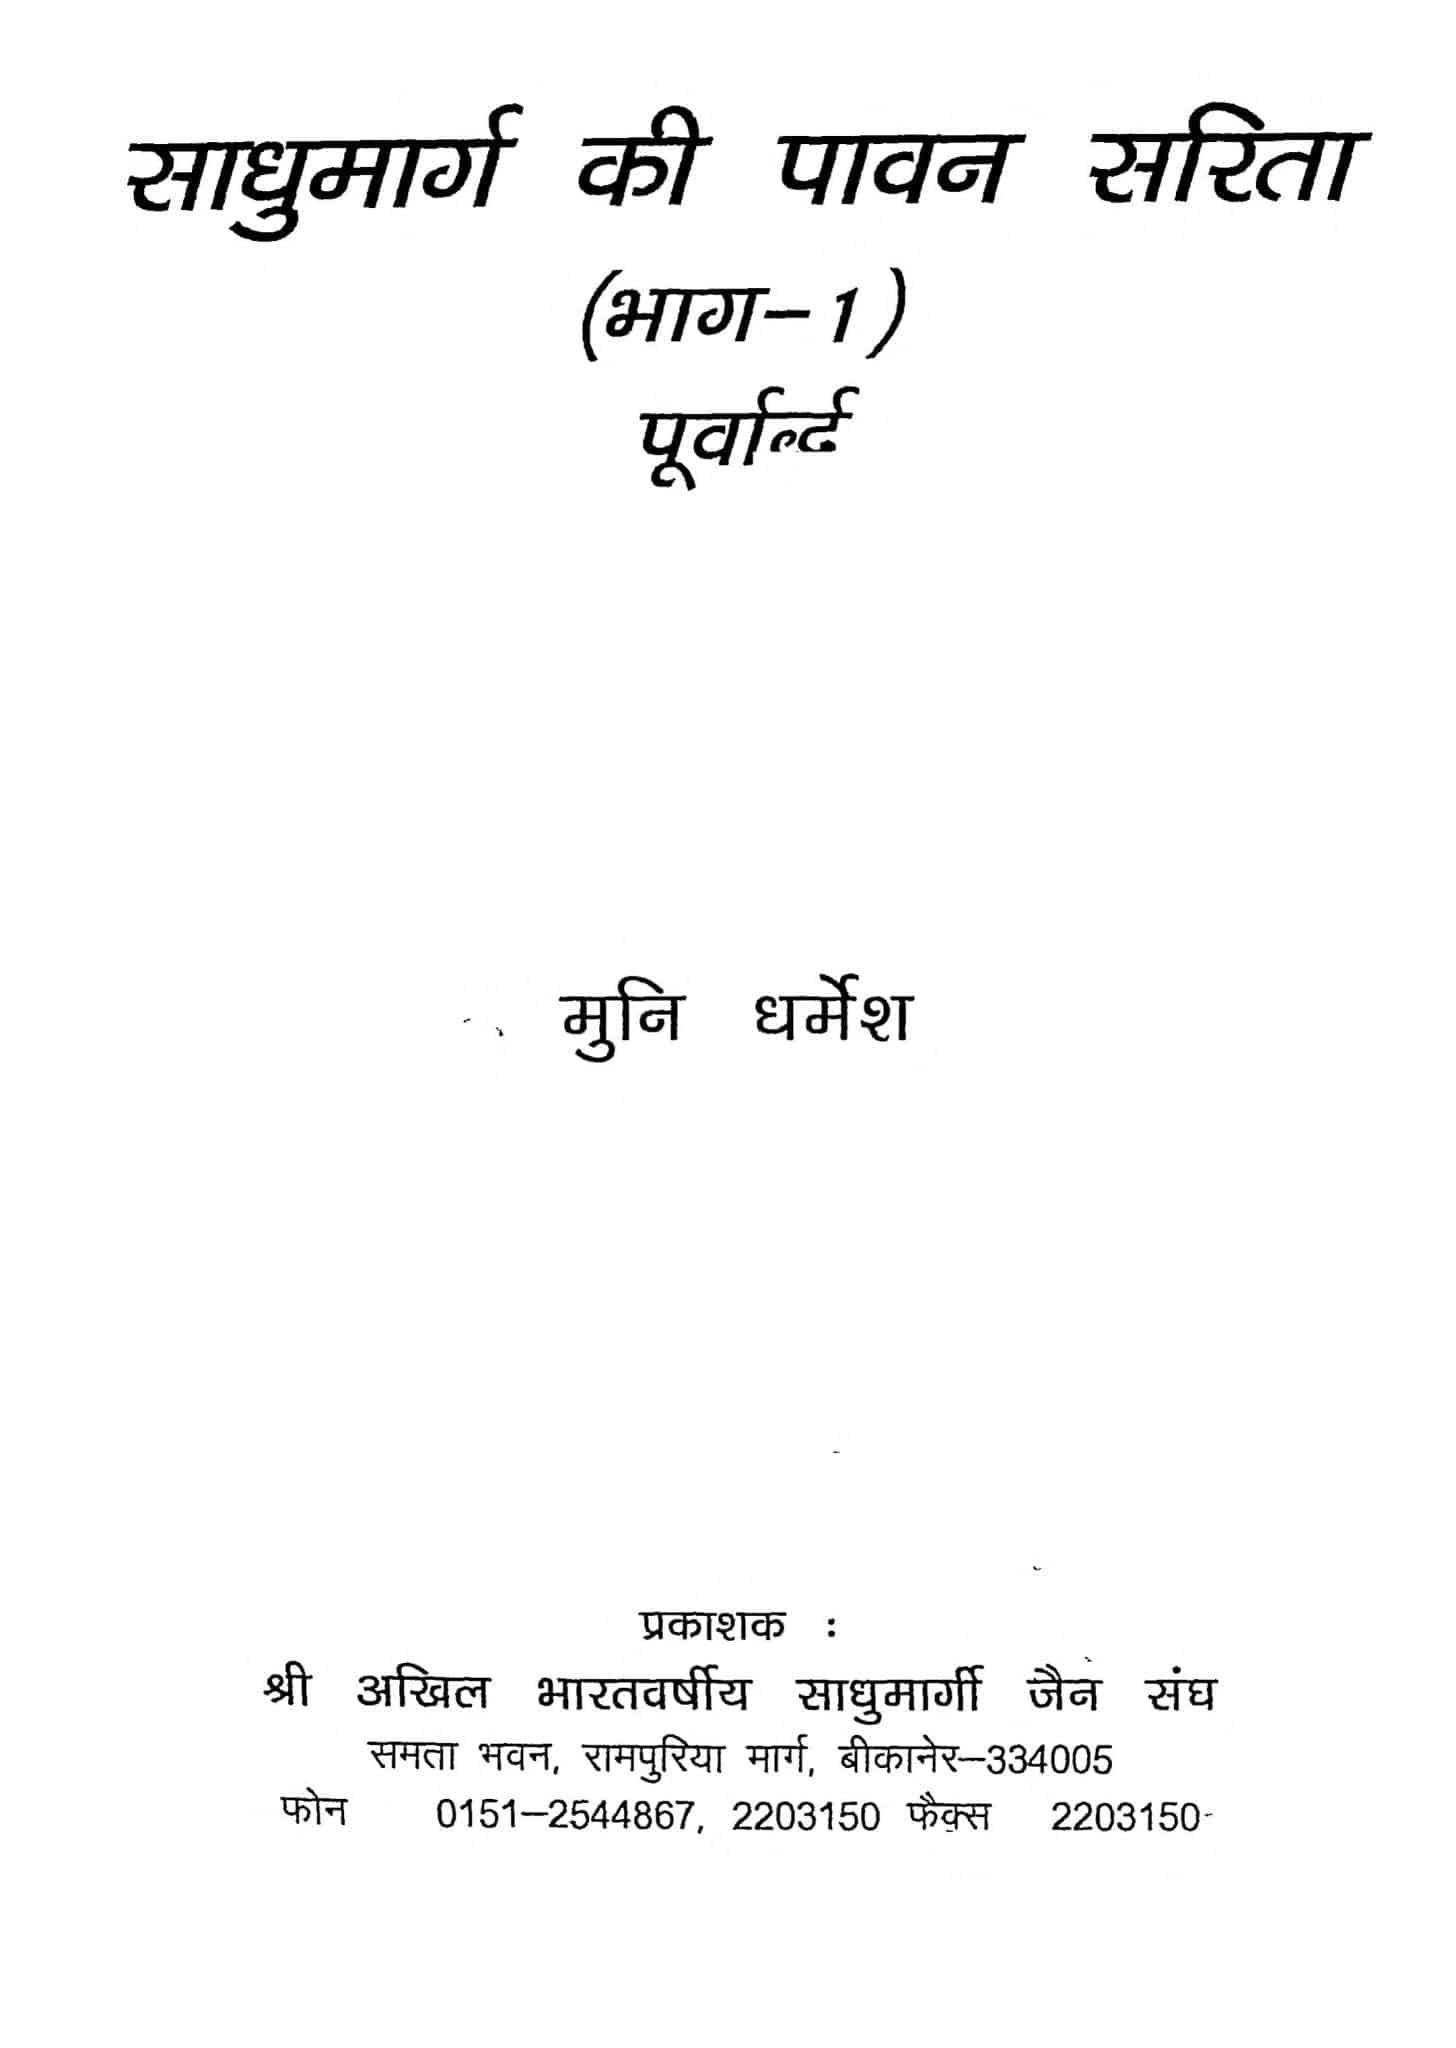 Book Image : साधुमार्ग की पावन सरिता (भाग-1) - Sadhumarg ki paavan sarita (Bhaag-1)